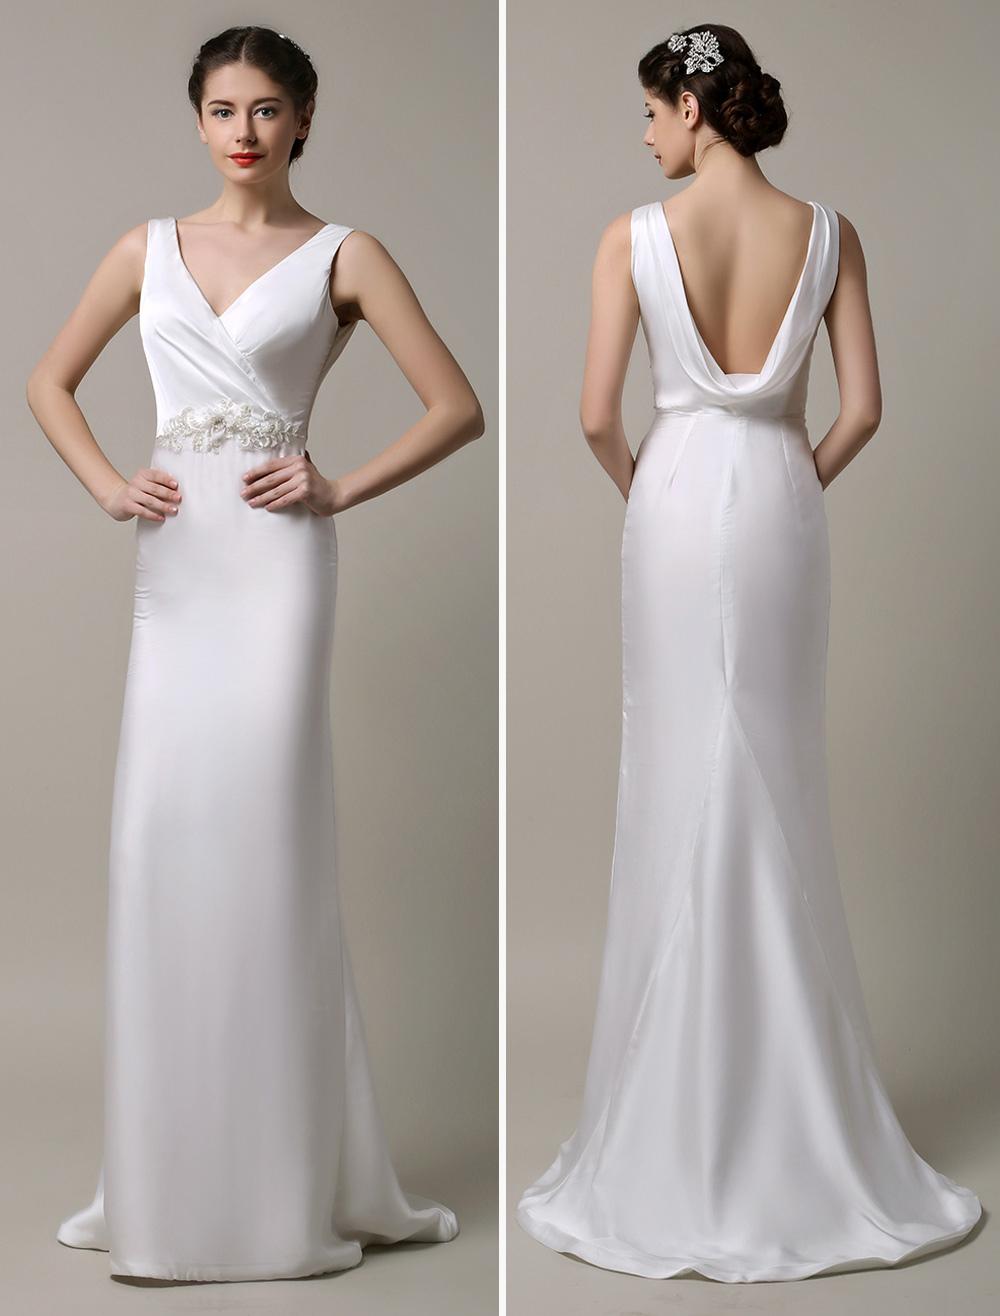 Ivory Satin Deep V-neck and Cowlback With Embellished Sash Wedding Dress